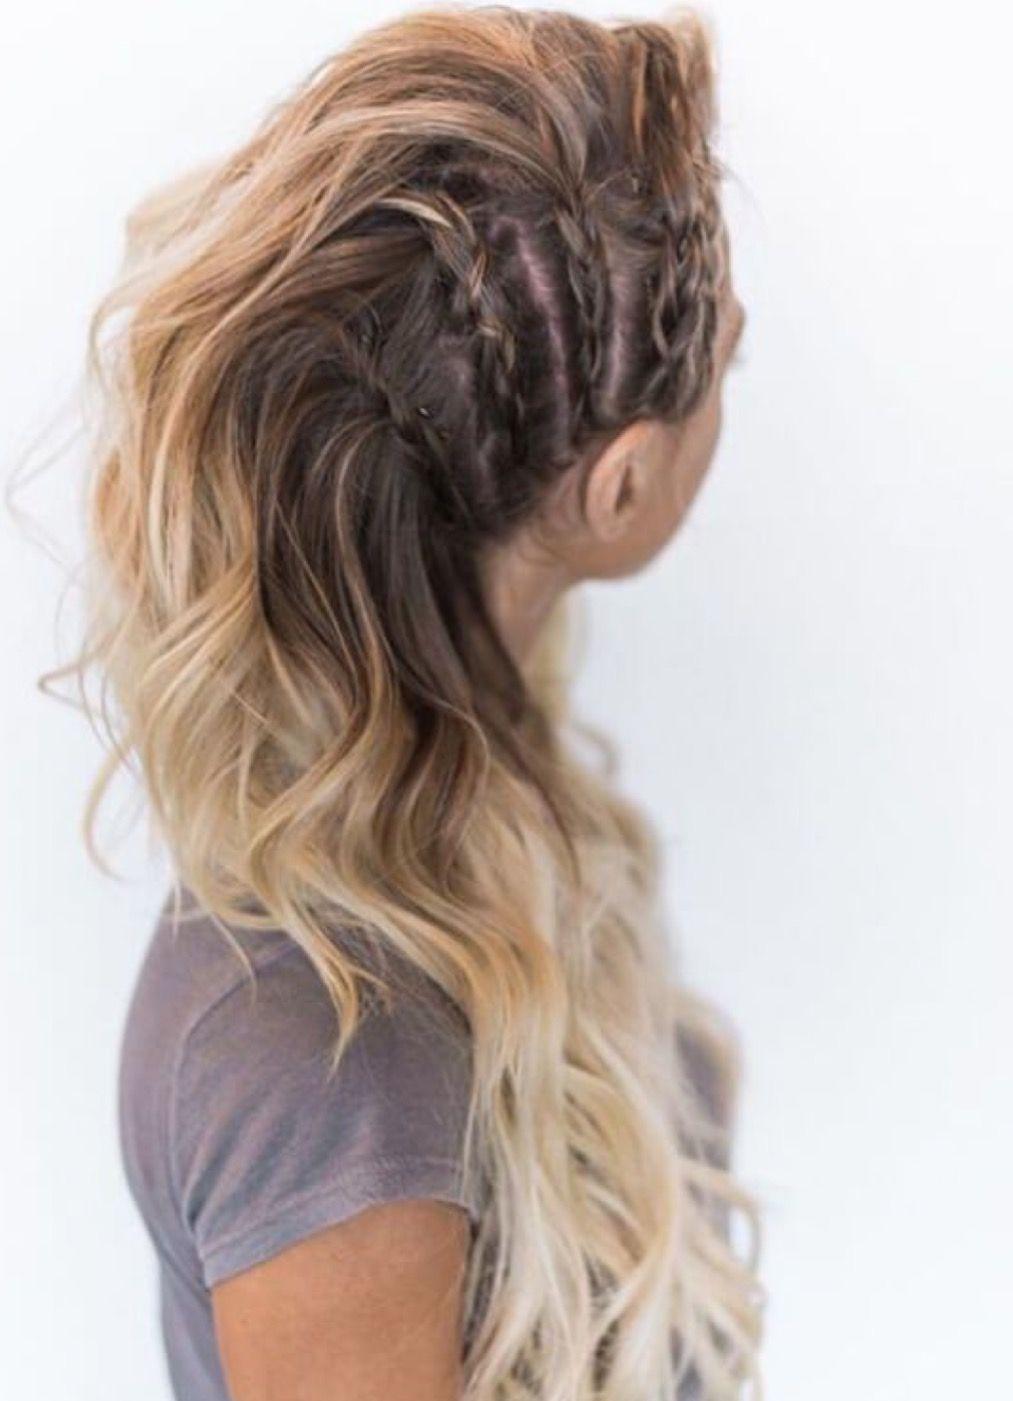 Avantegardeinspired side braid faux mohawk with curls all falling